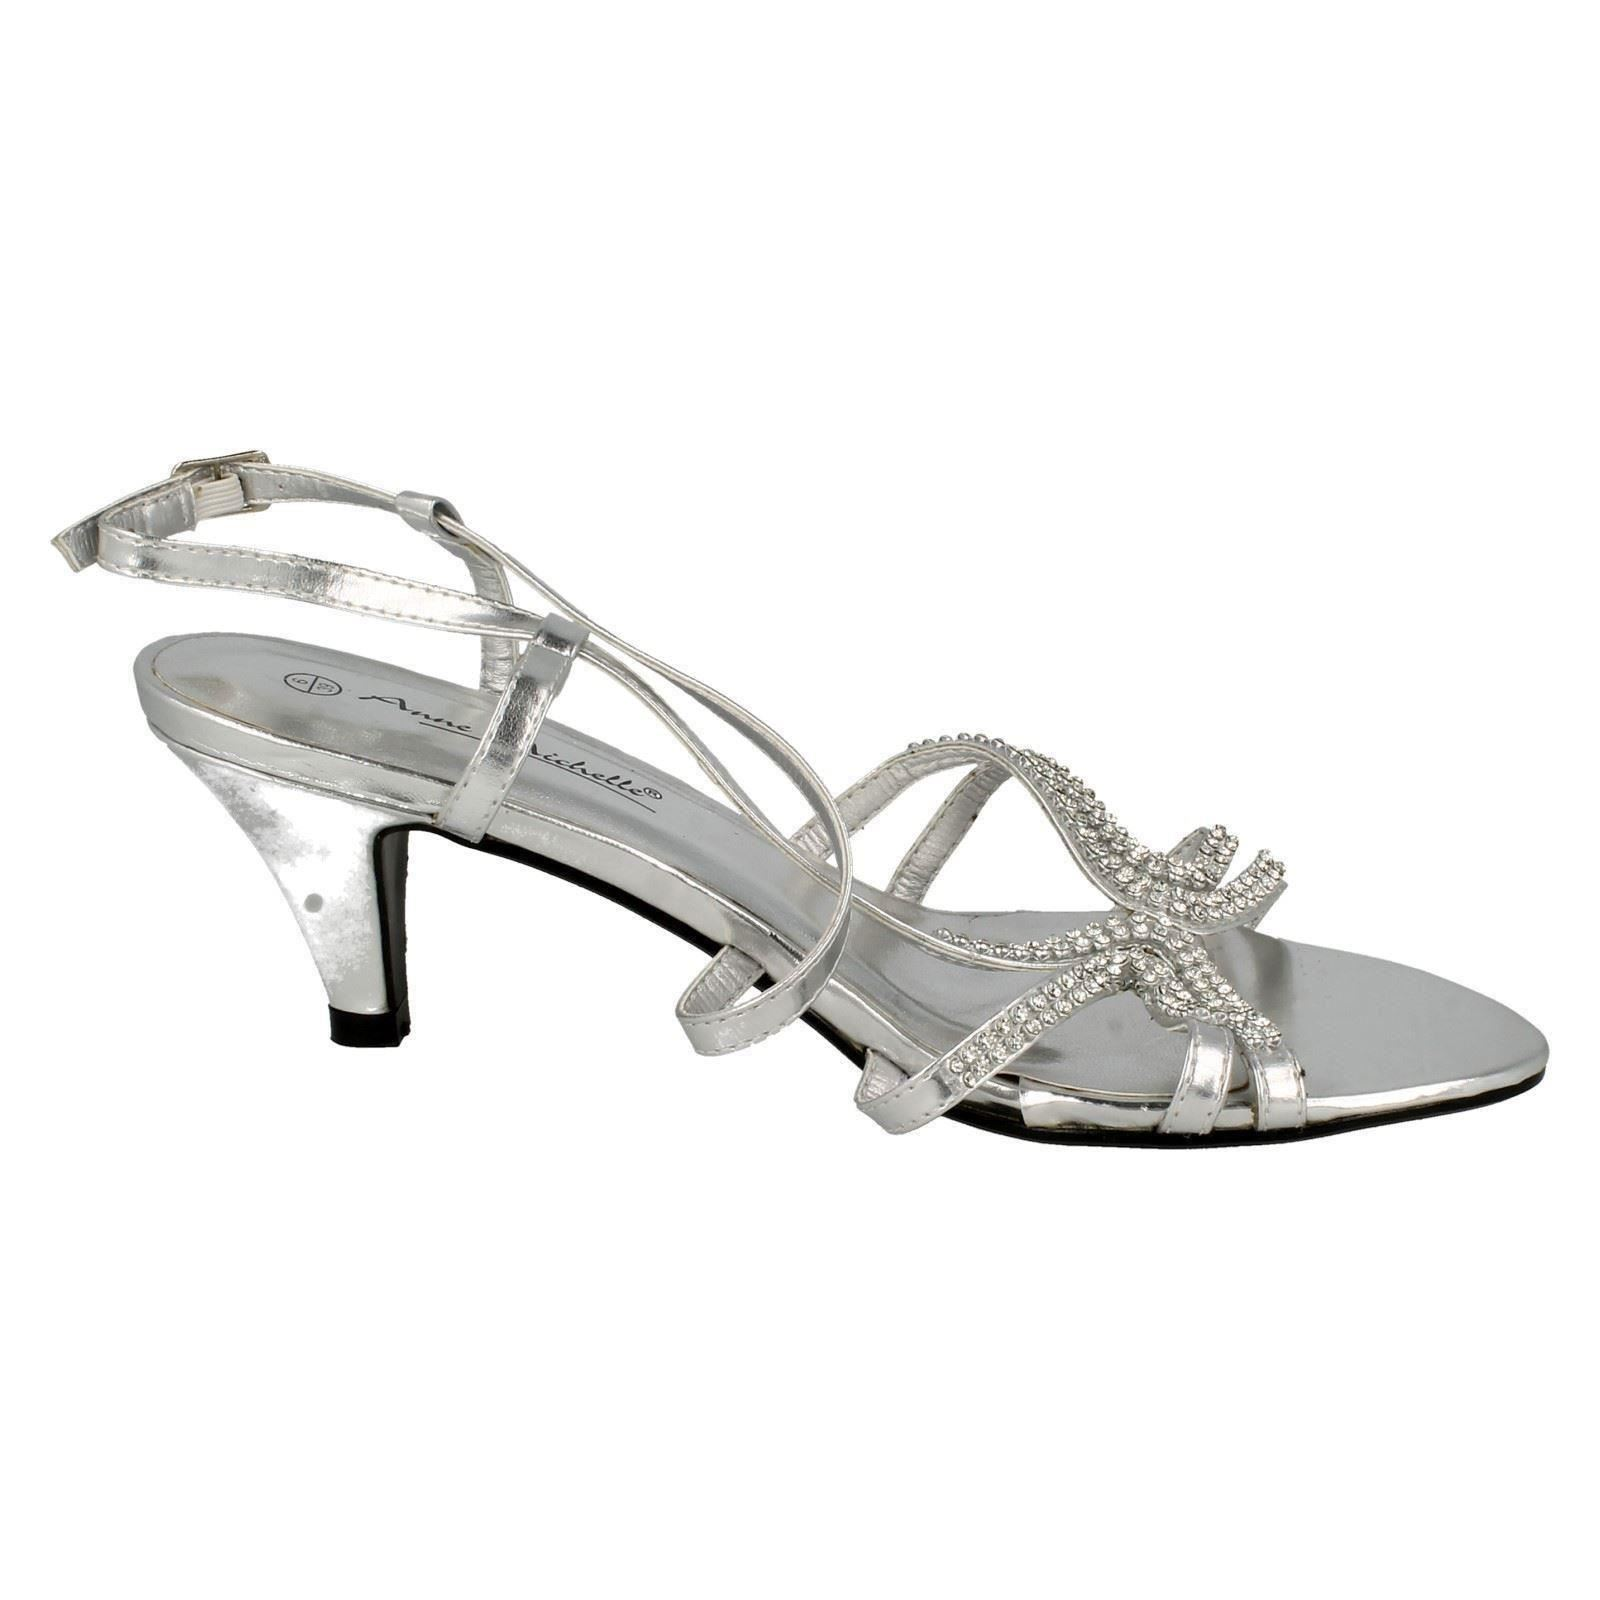 Ladies-Anne-Michelle-Buckle-Diamante-Detail-Cross-Over-Heels